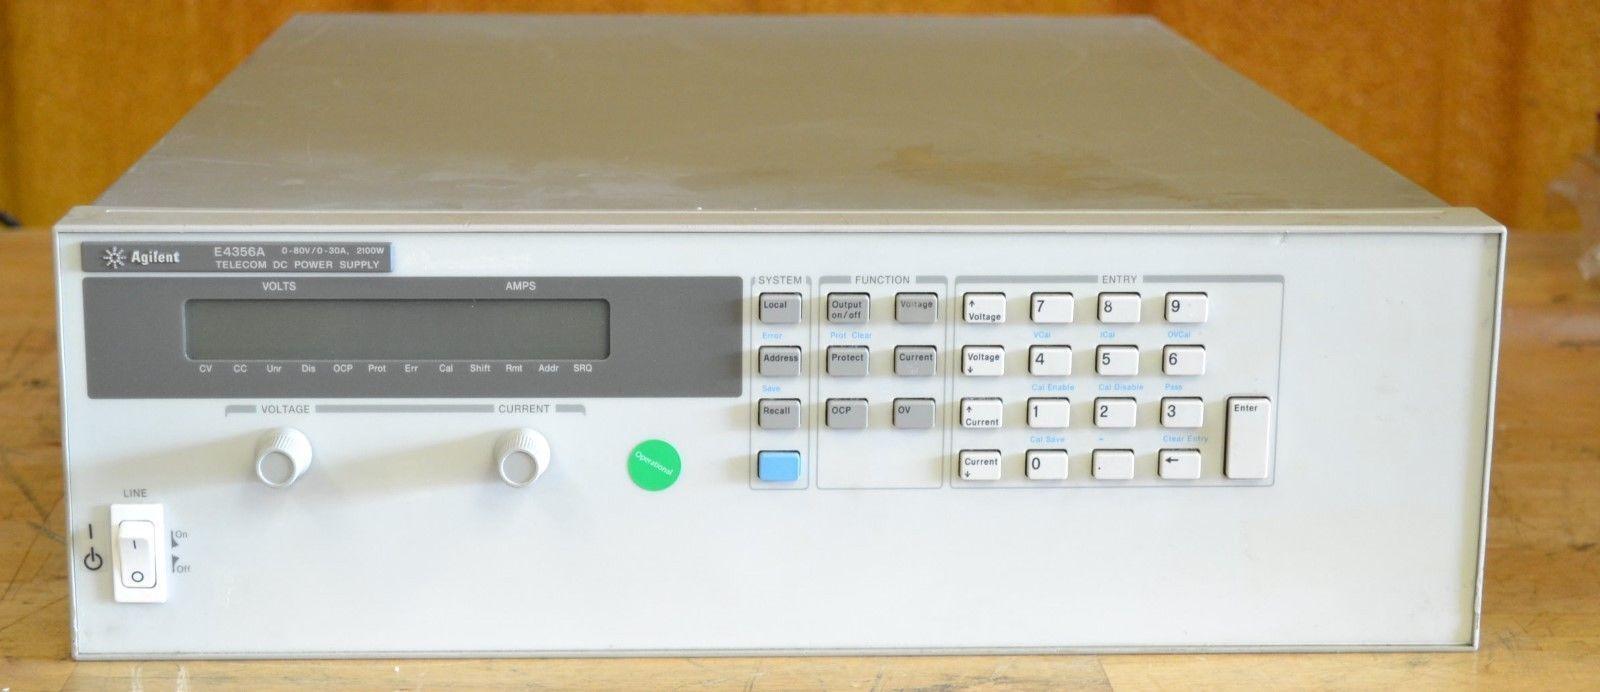 Hp Agilent E4356a Telecom Dc Power Supply 80v 30a Ebay 0 30 Vdc Stabilized With Current Control 0002